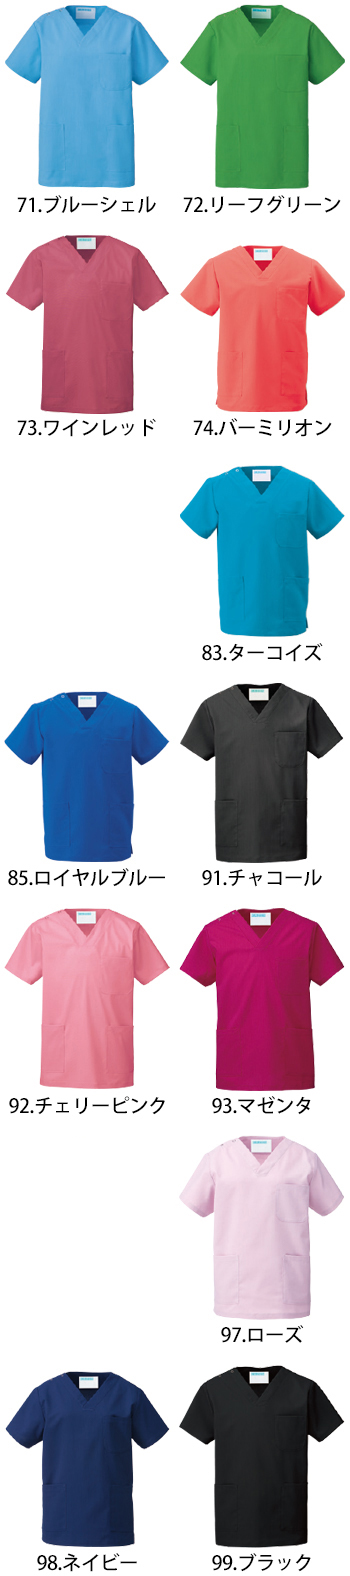 KAZEN(アプロンワールド) スクラブ(男女兼用) [133]